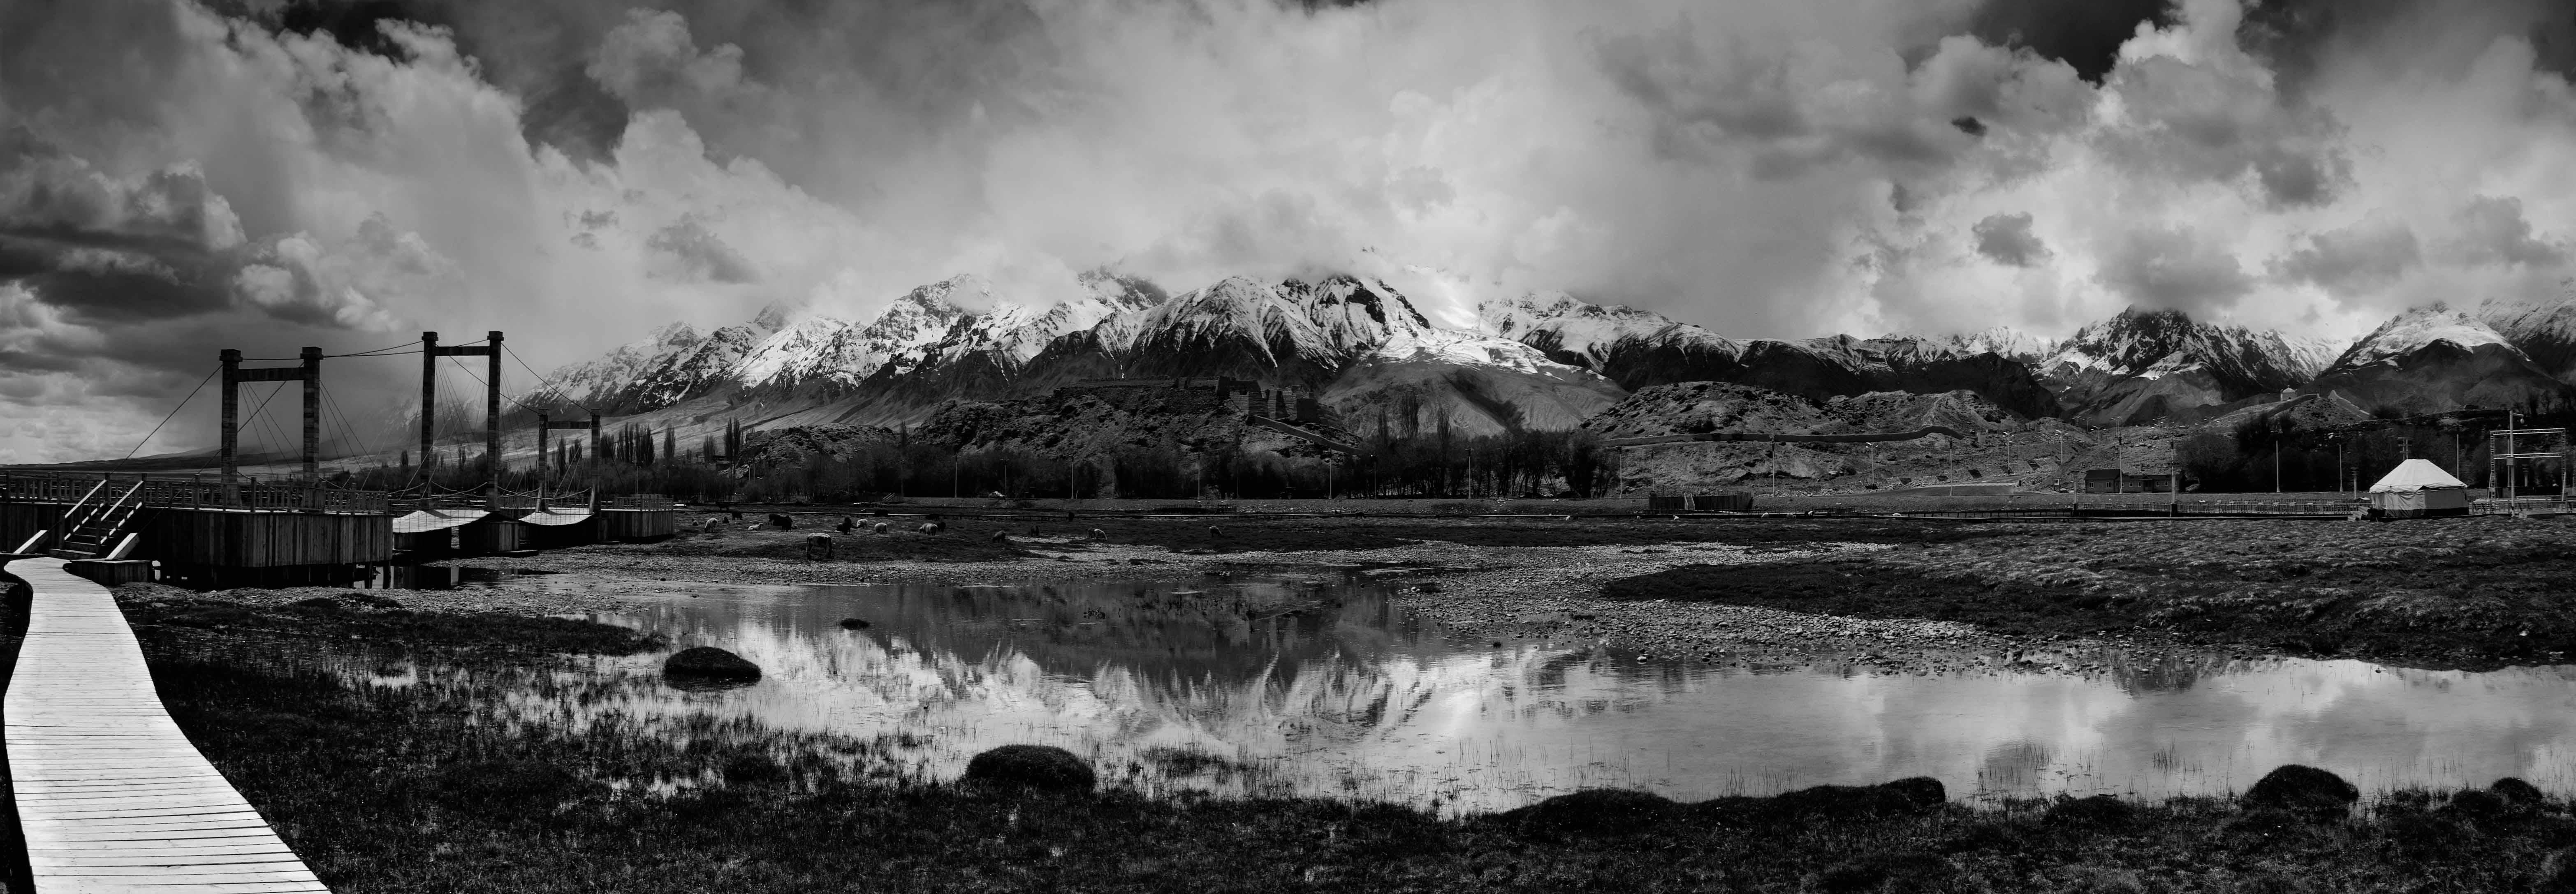 Terms And Conditions >> Kashgar-Karakoram Highway | Portfolios | Corneliu Cazacu